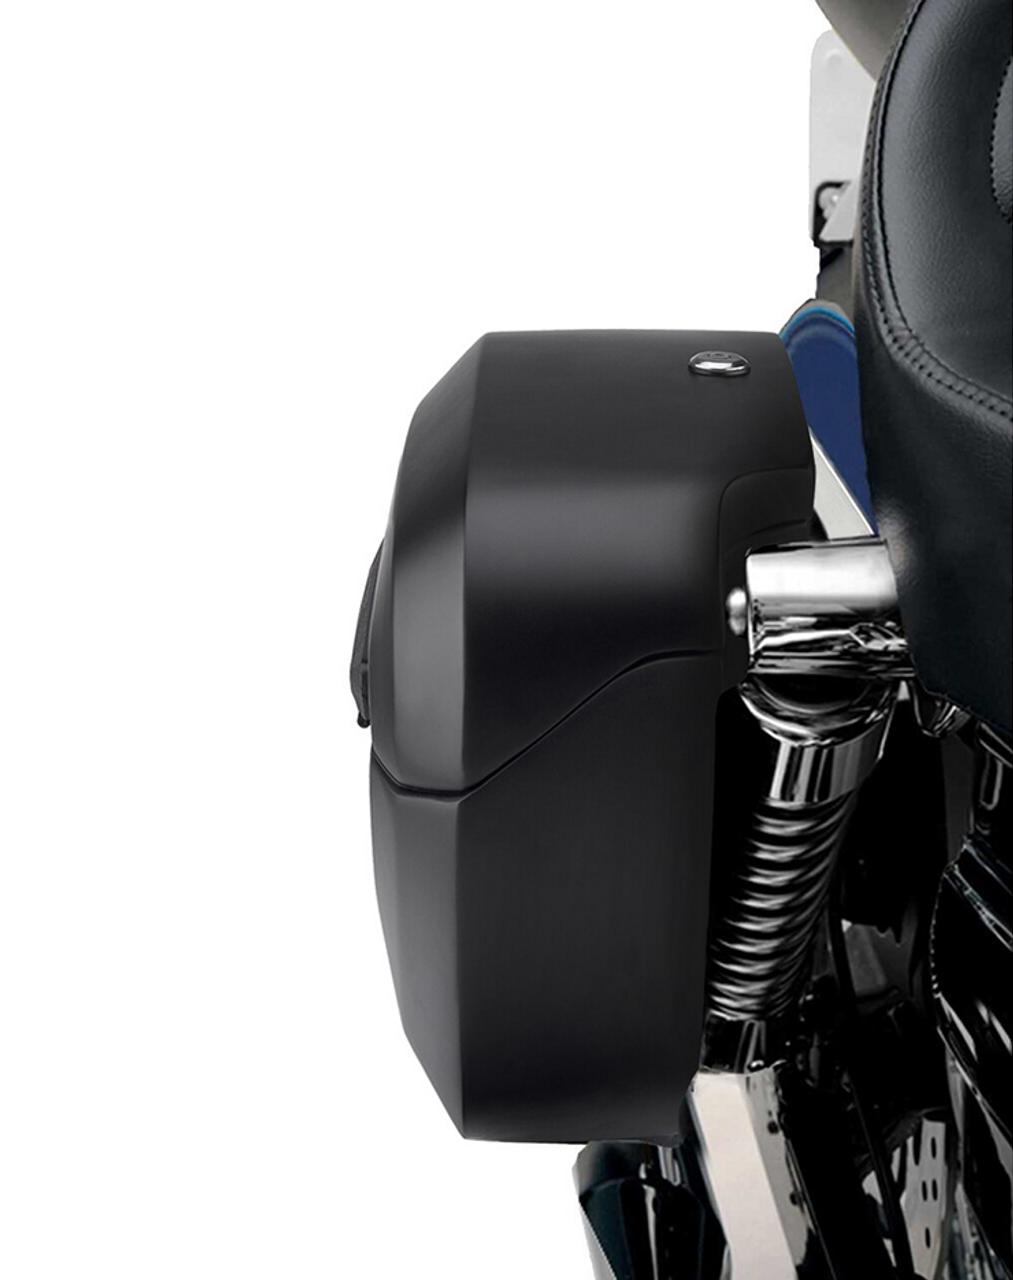 Viking Lamellar Shock Cutout Large Matte Motorcycle Hard Saddlebags For Harley Dyna Street Bob FXDB shock cutout view